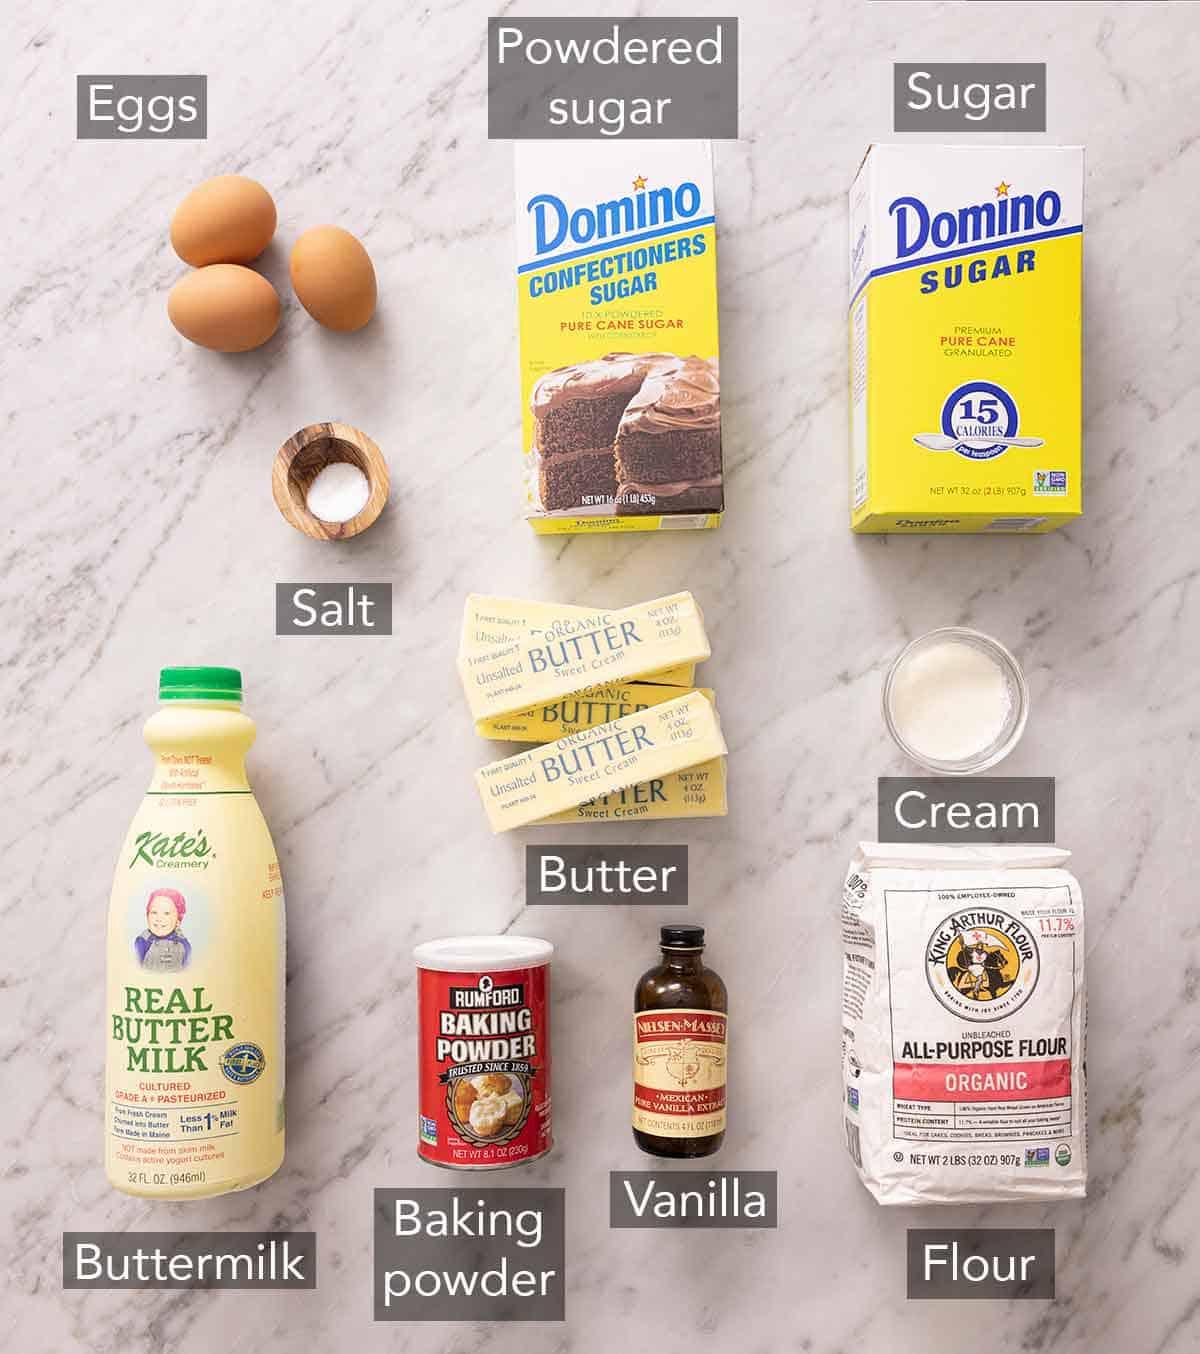 Ingredients for vanilla cake.